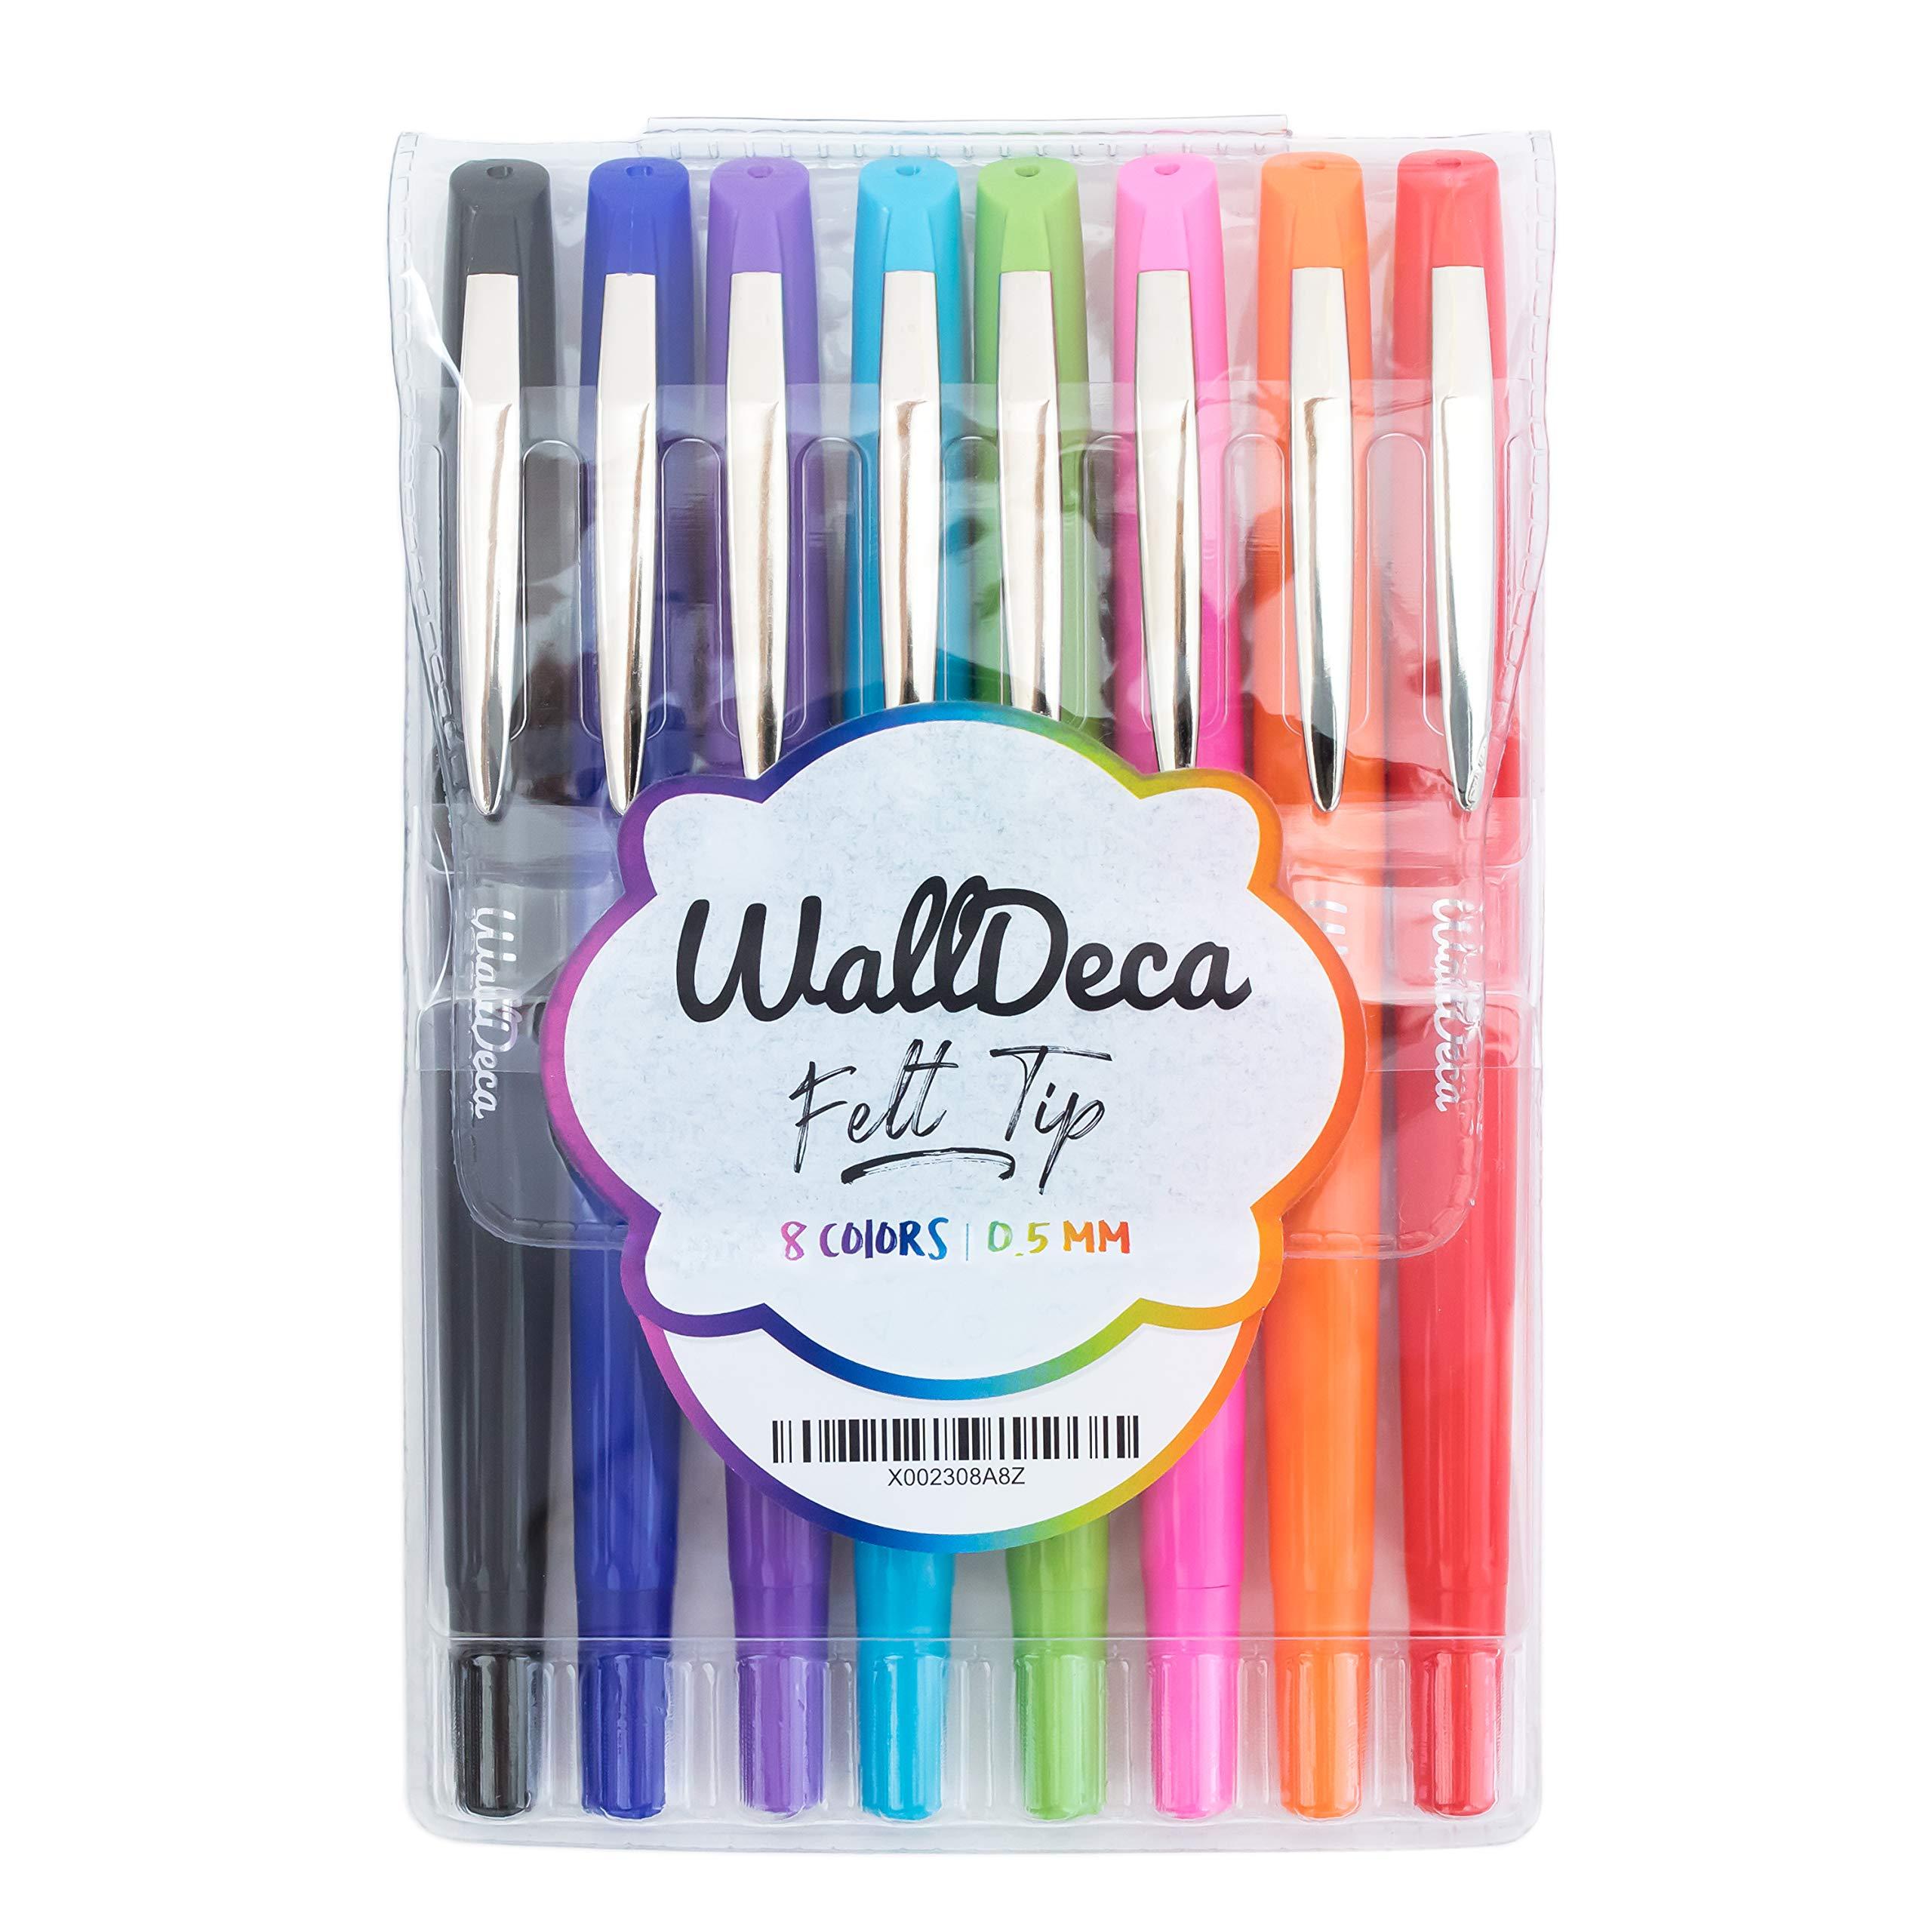 WallDeca Assorted Everyday Journals Doodling